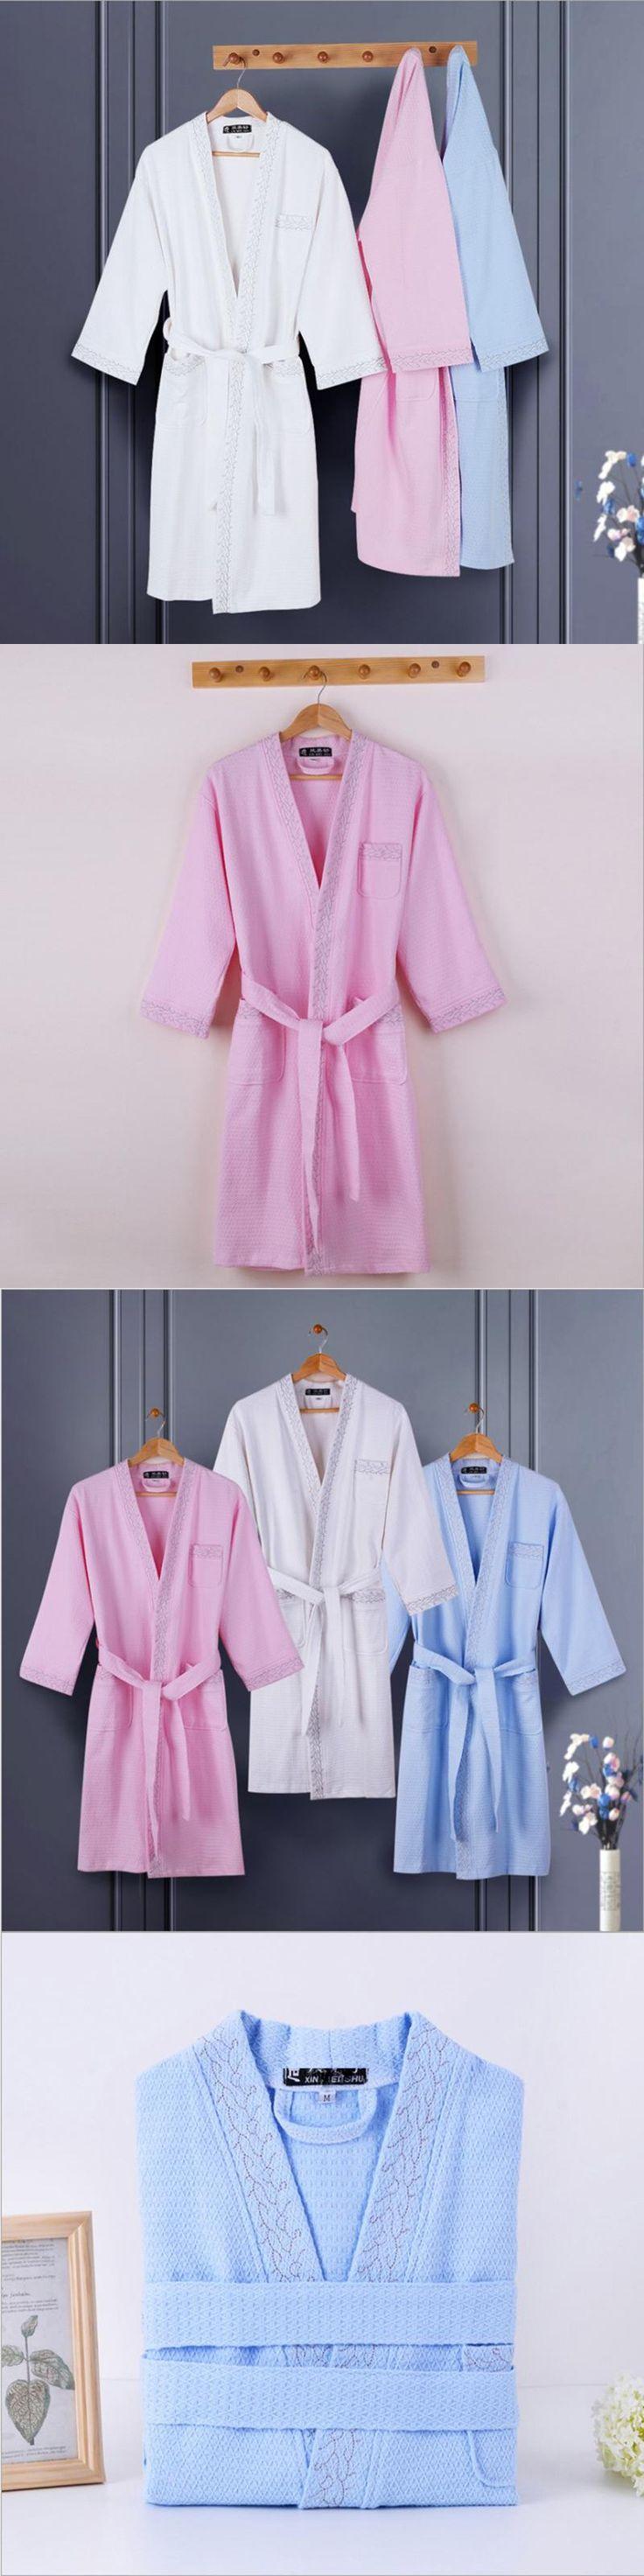 New Men 100% Cotton Summer Long Waffle Bathrobe  Women Men Japanese Kimono Bath Robe Men's Plus Size Dressing Gown Male Robes